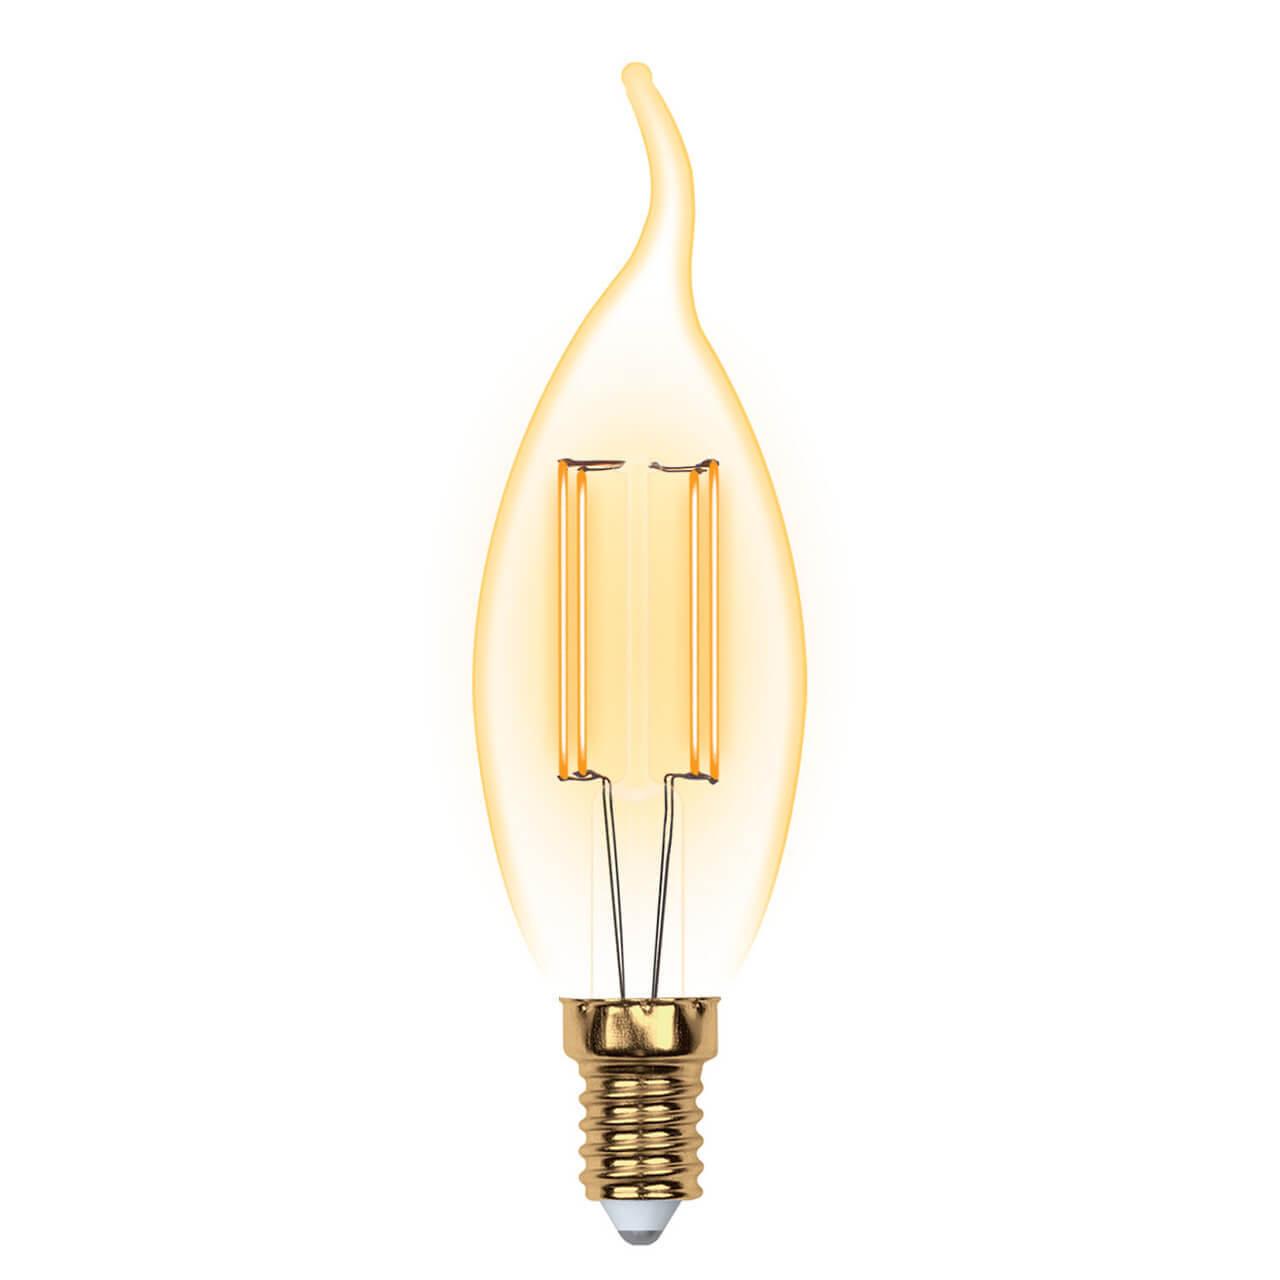 Лампа светодиодная (UL-00002397) E14 5W 2250K прозрачная LED-CW35-5W/GOLDEN/E14 GLV21GO